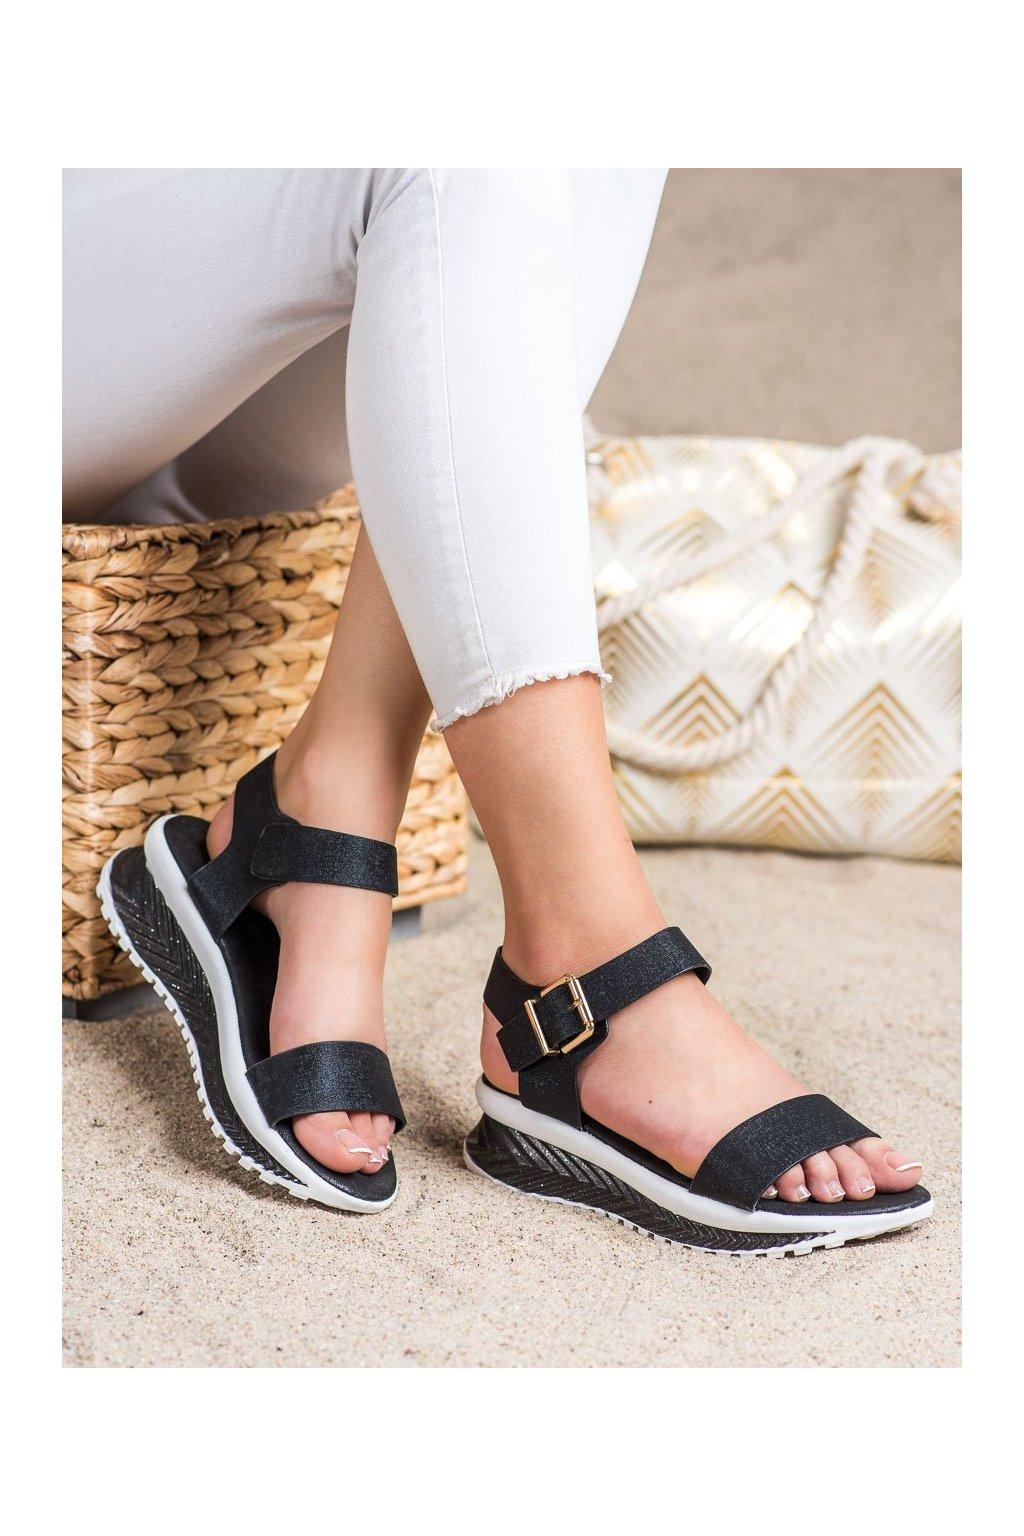 Čierne sandále Groto gogo kod G250B